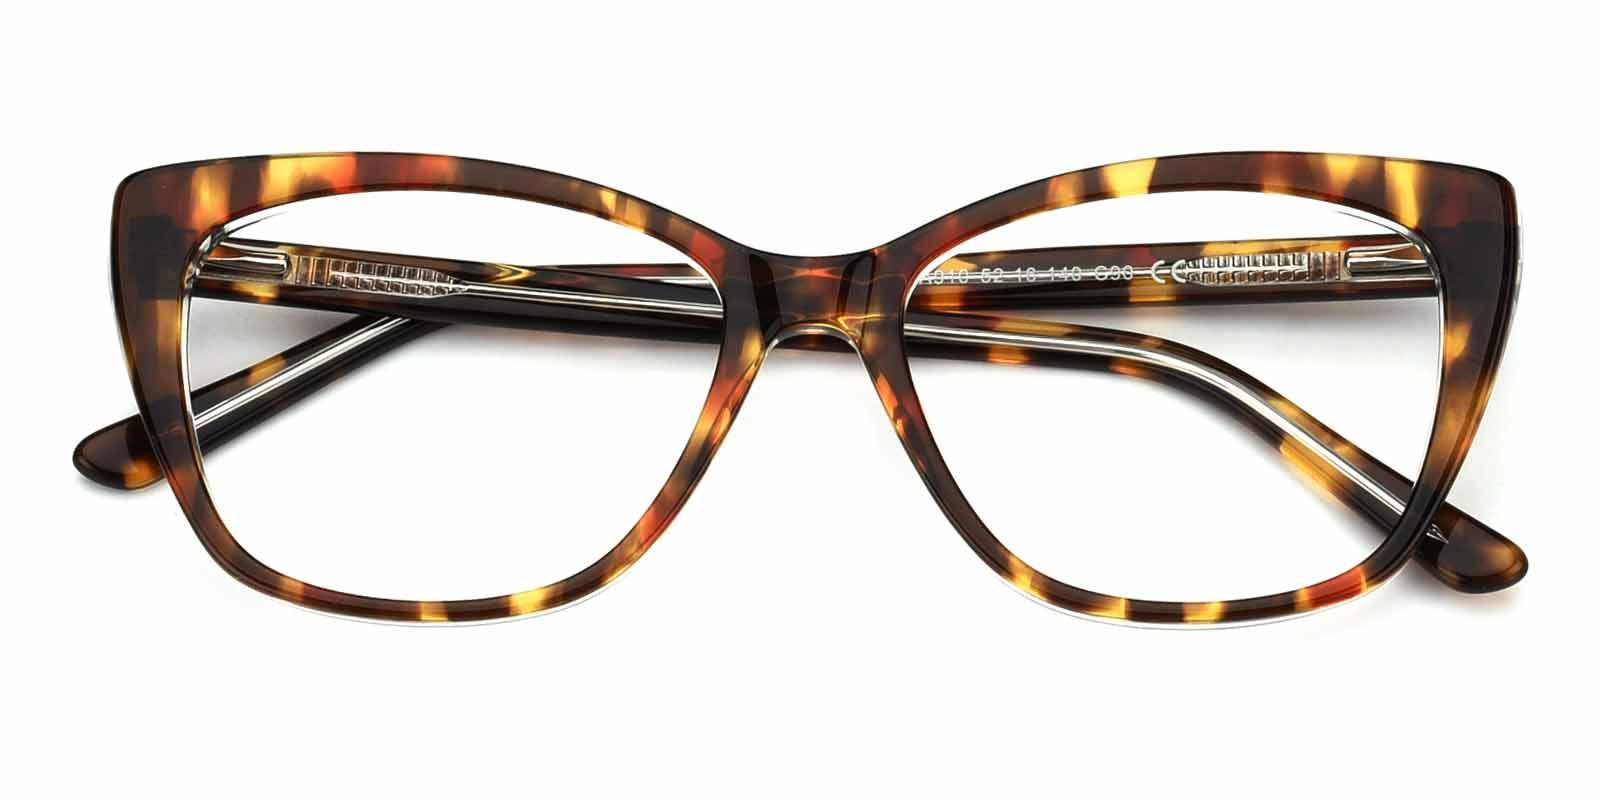 Kiko-Tortoise-Cat-Acetate-Eyeglasses-detail